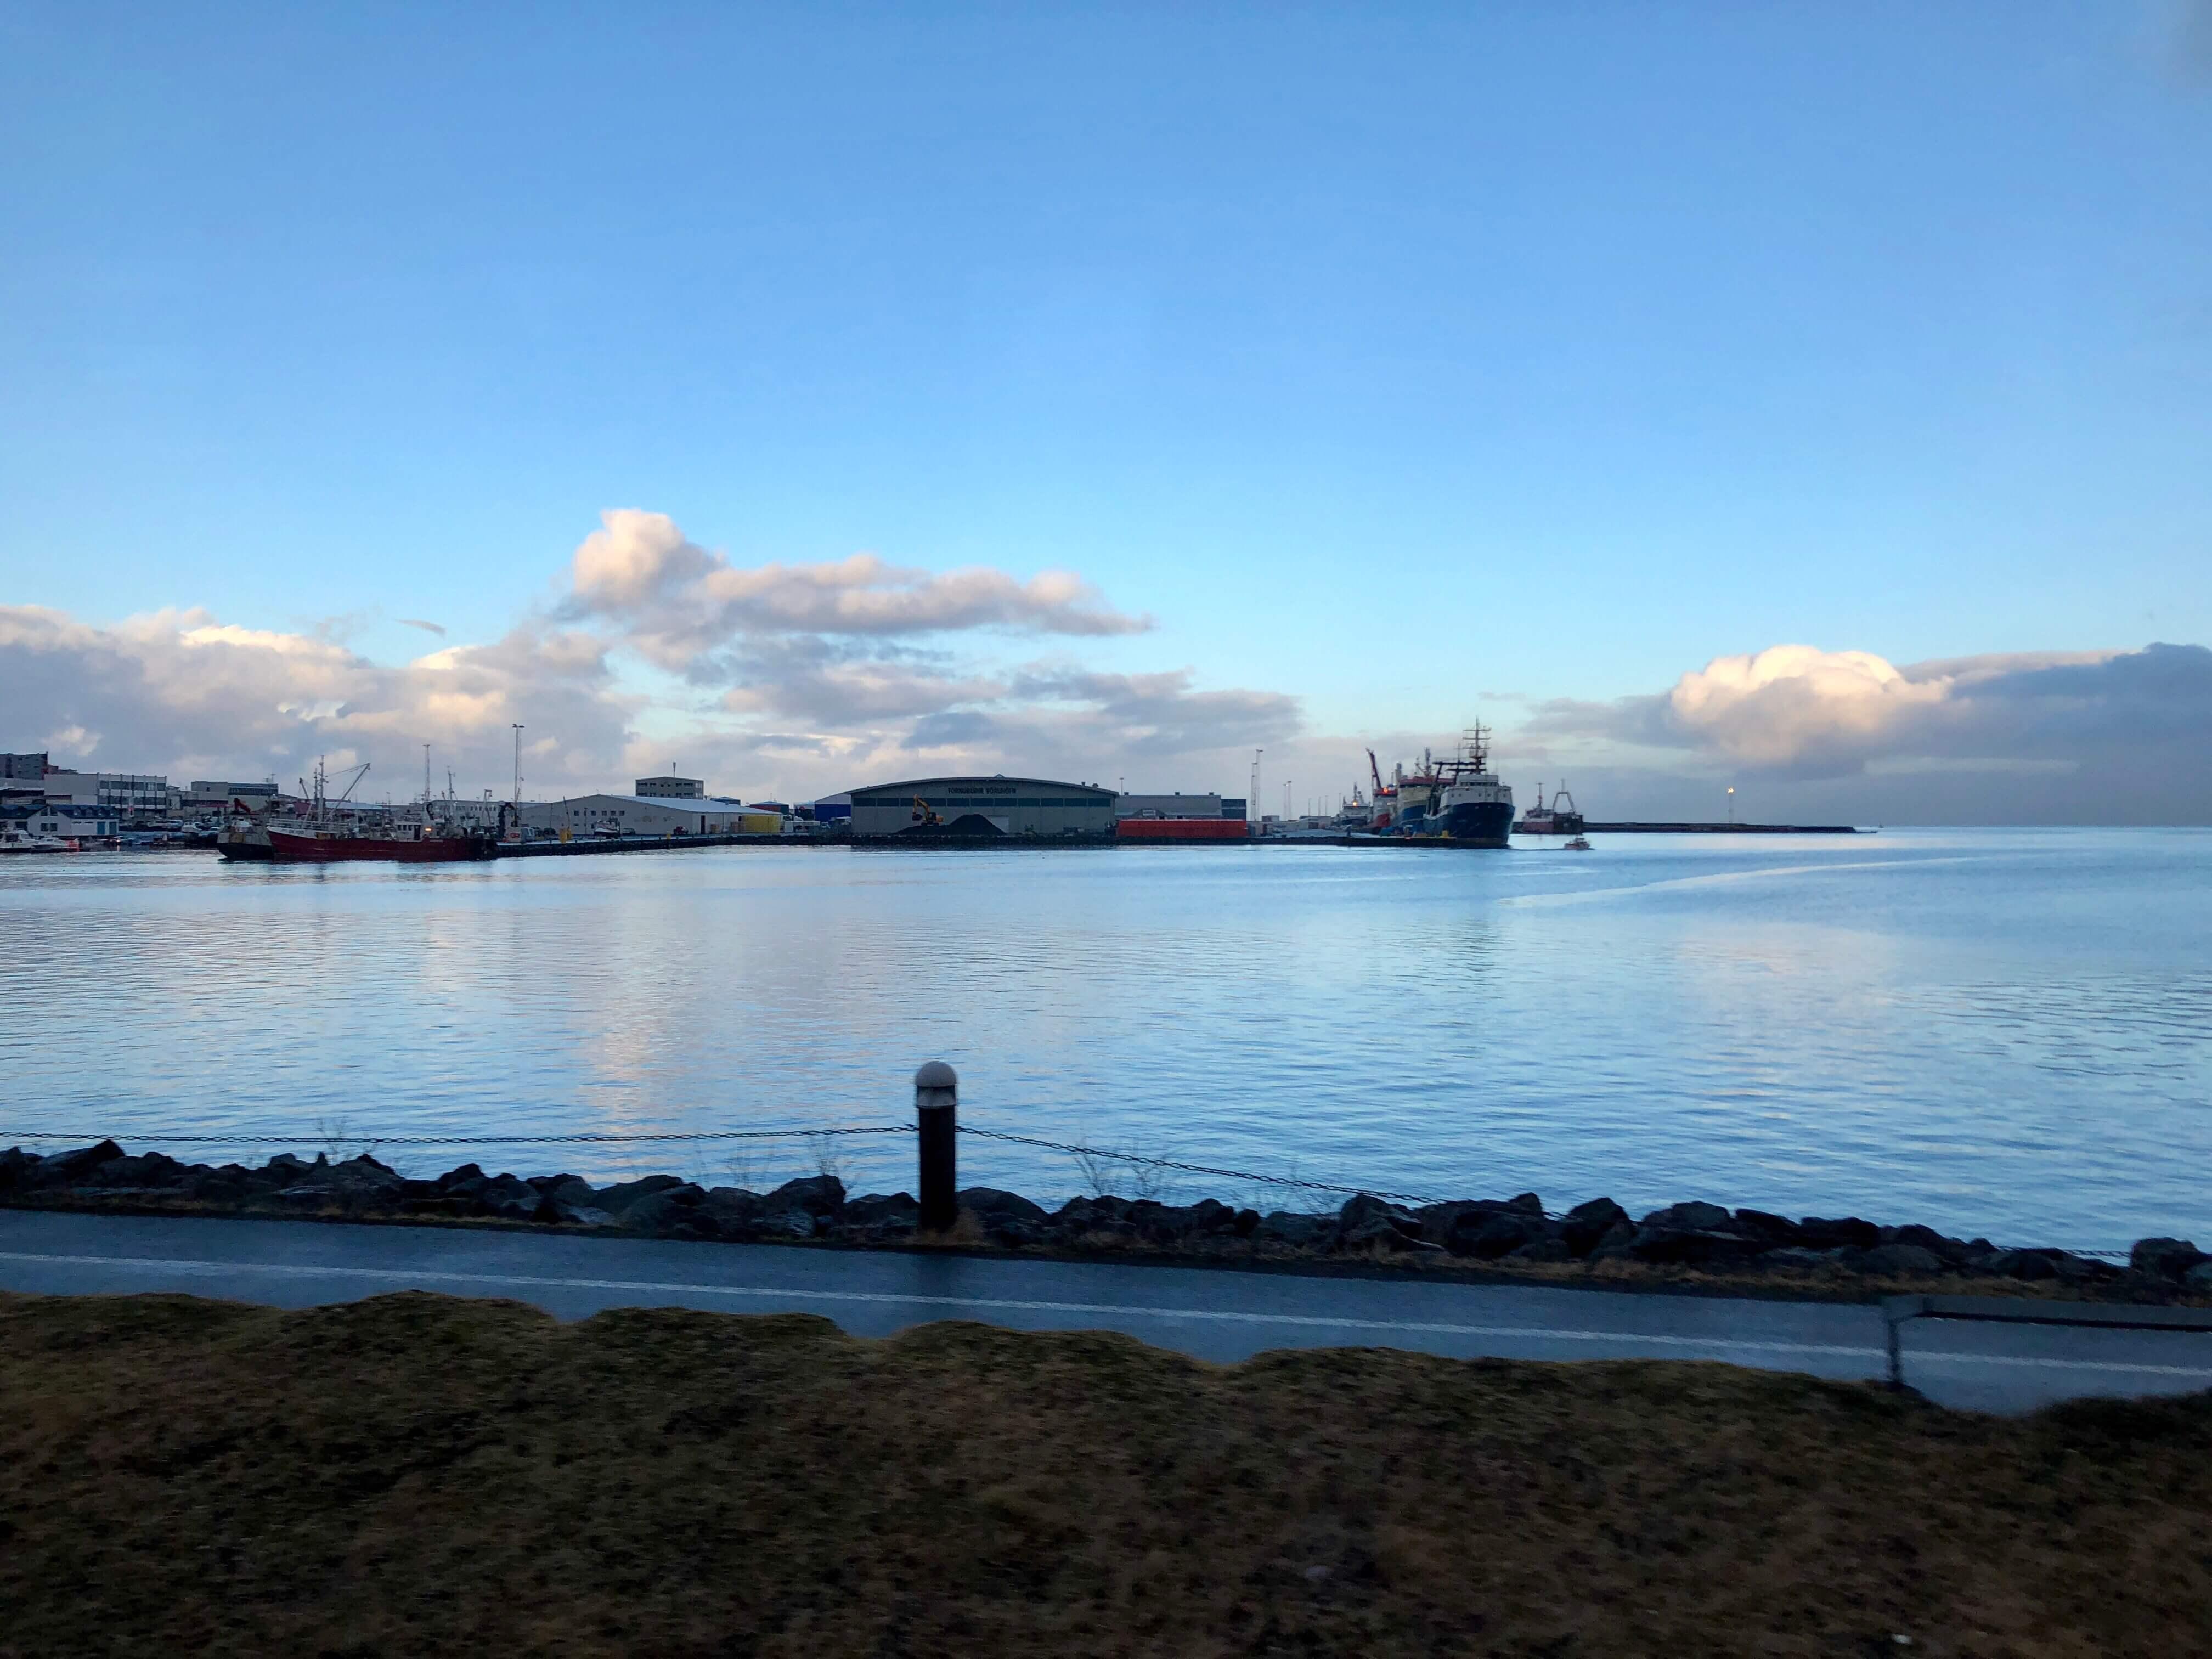 Reykjavík Iceland Harbor in the early morning